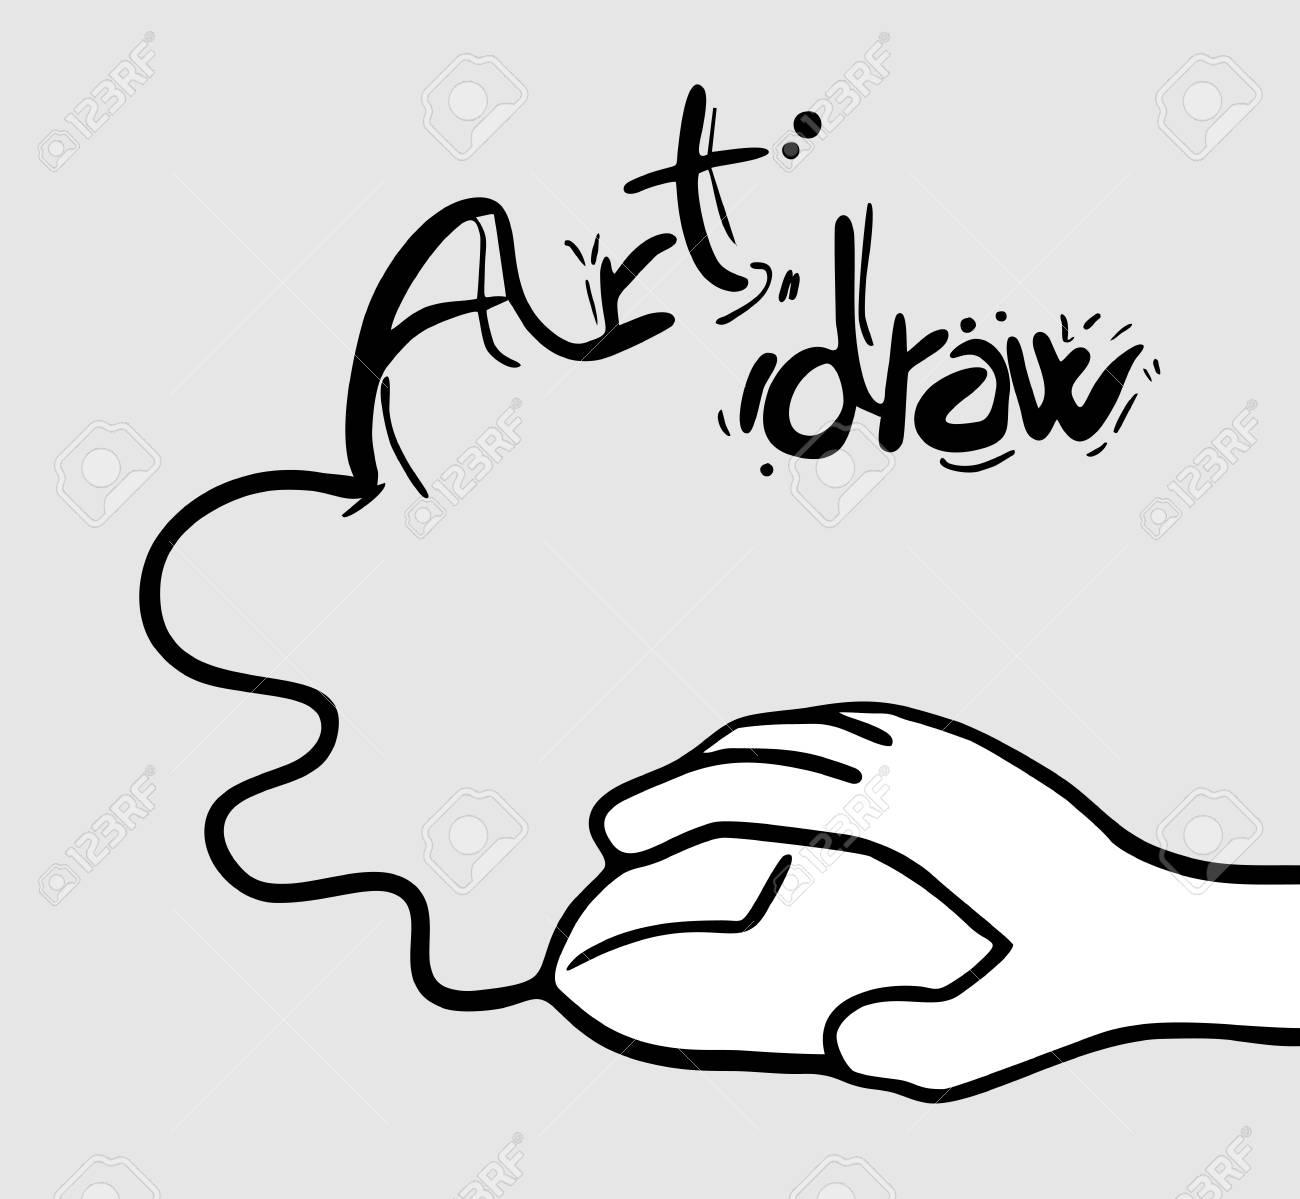 Computer art draw Stock Vector - 15292409